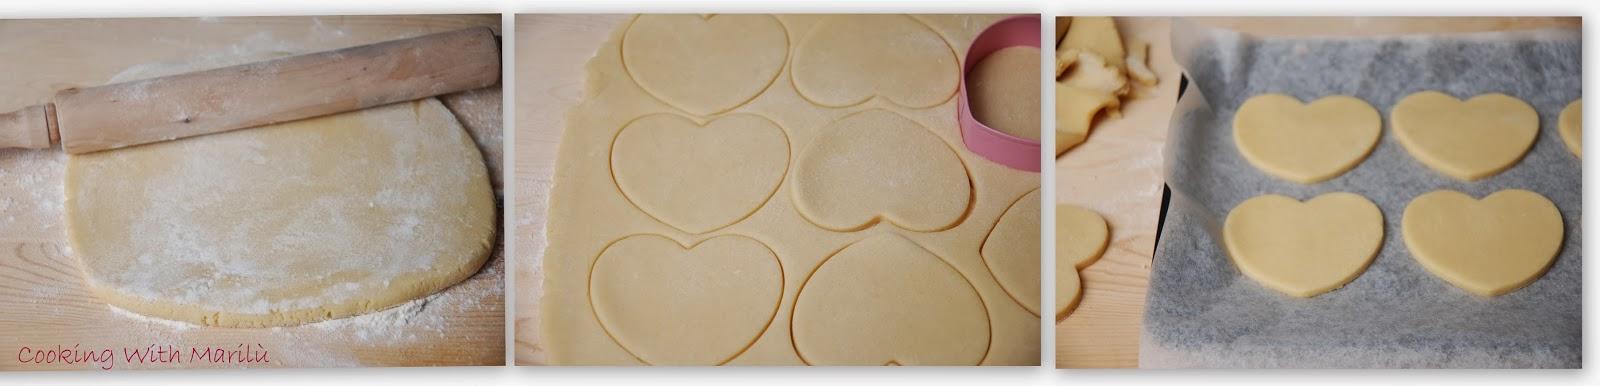 ricetta biscotti pasta frolla